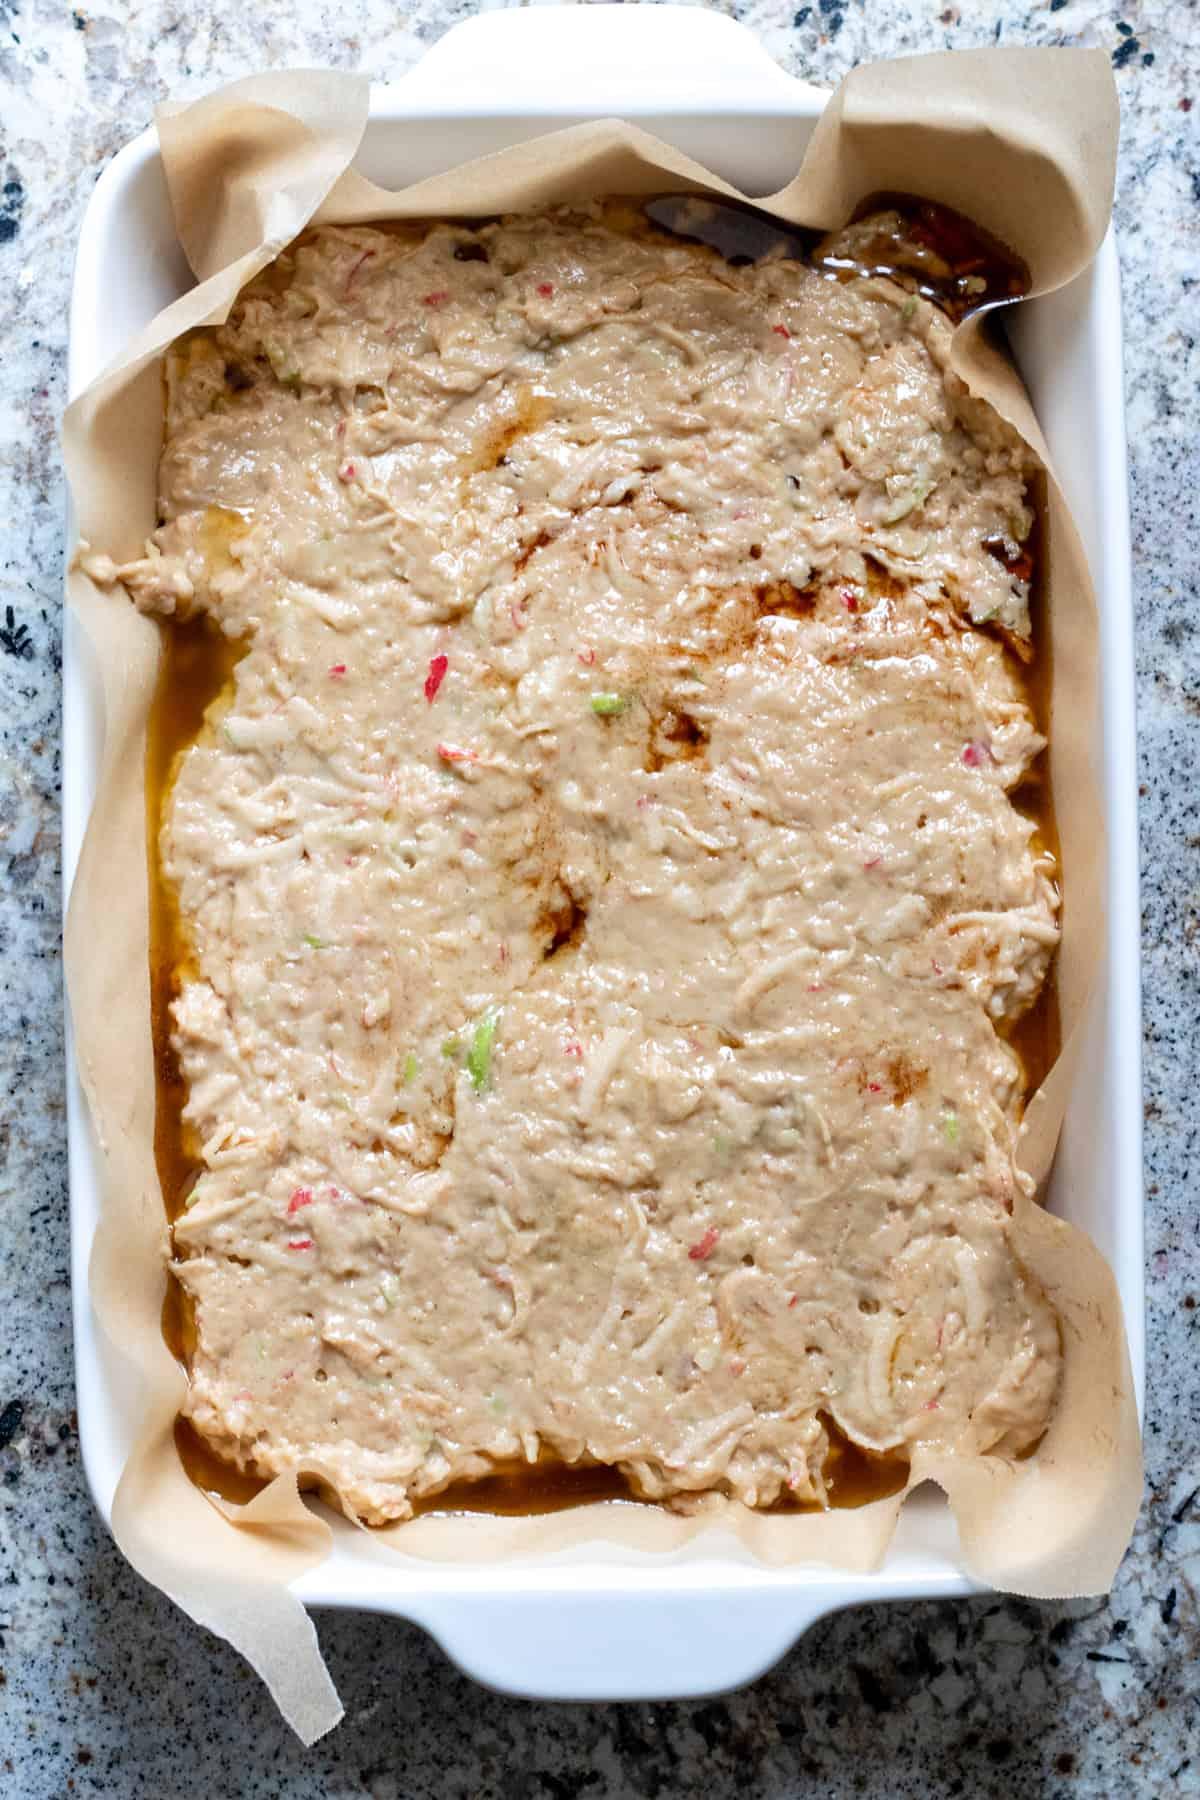 Apple cake spread over glaze in baking dish!